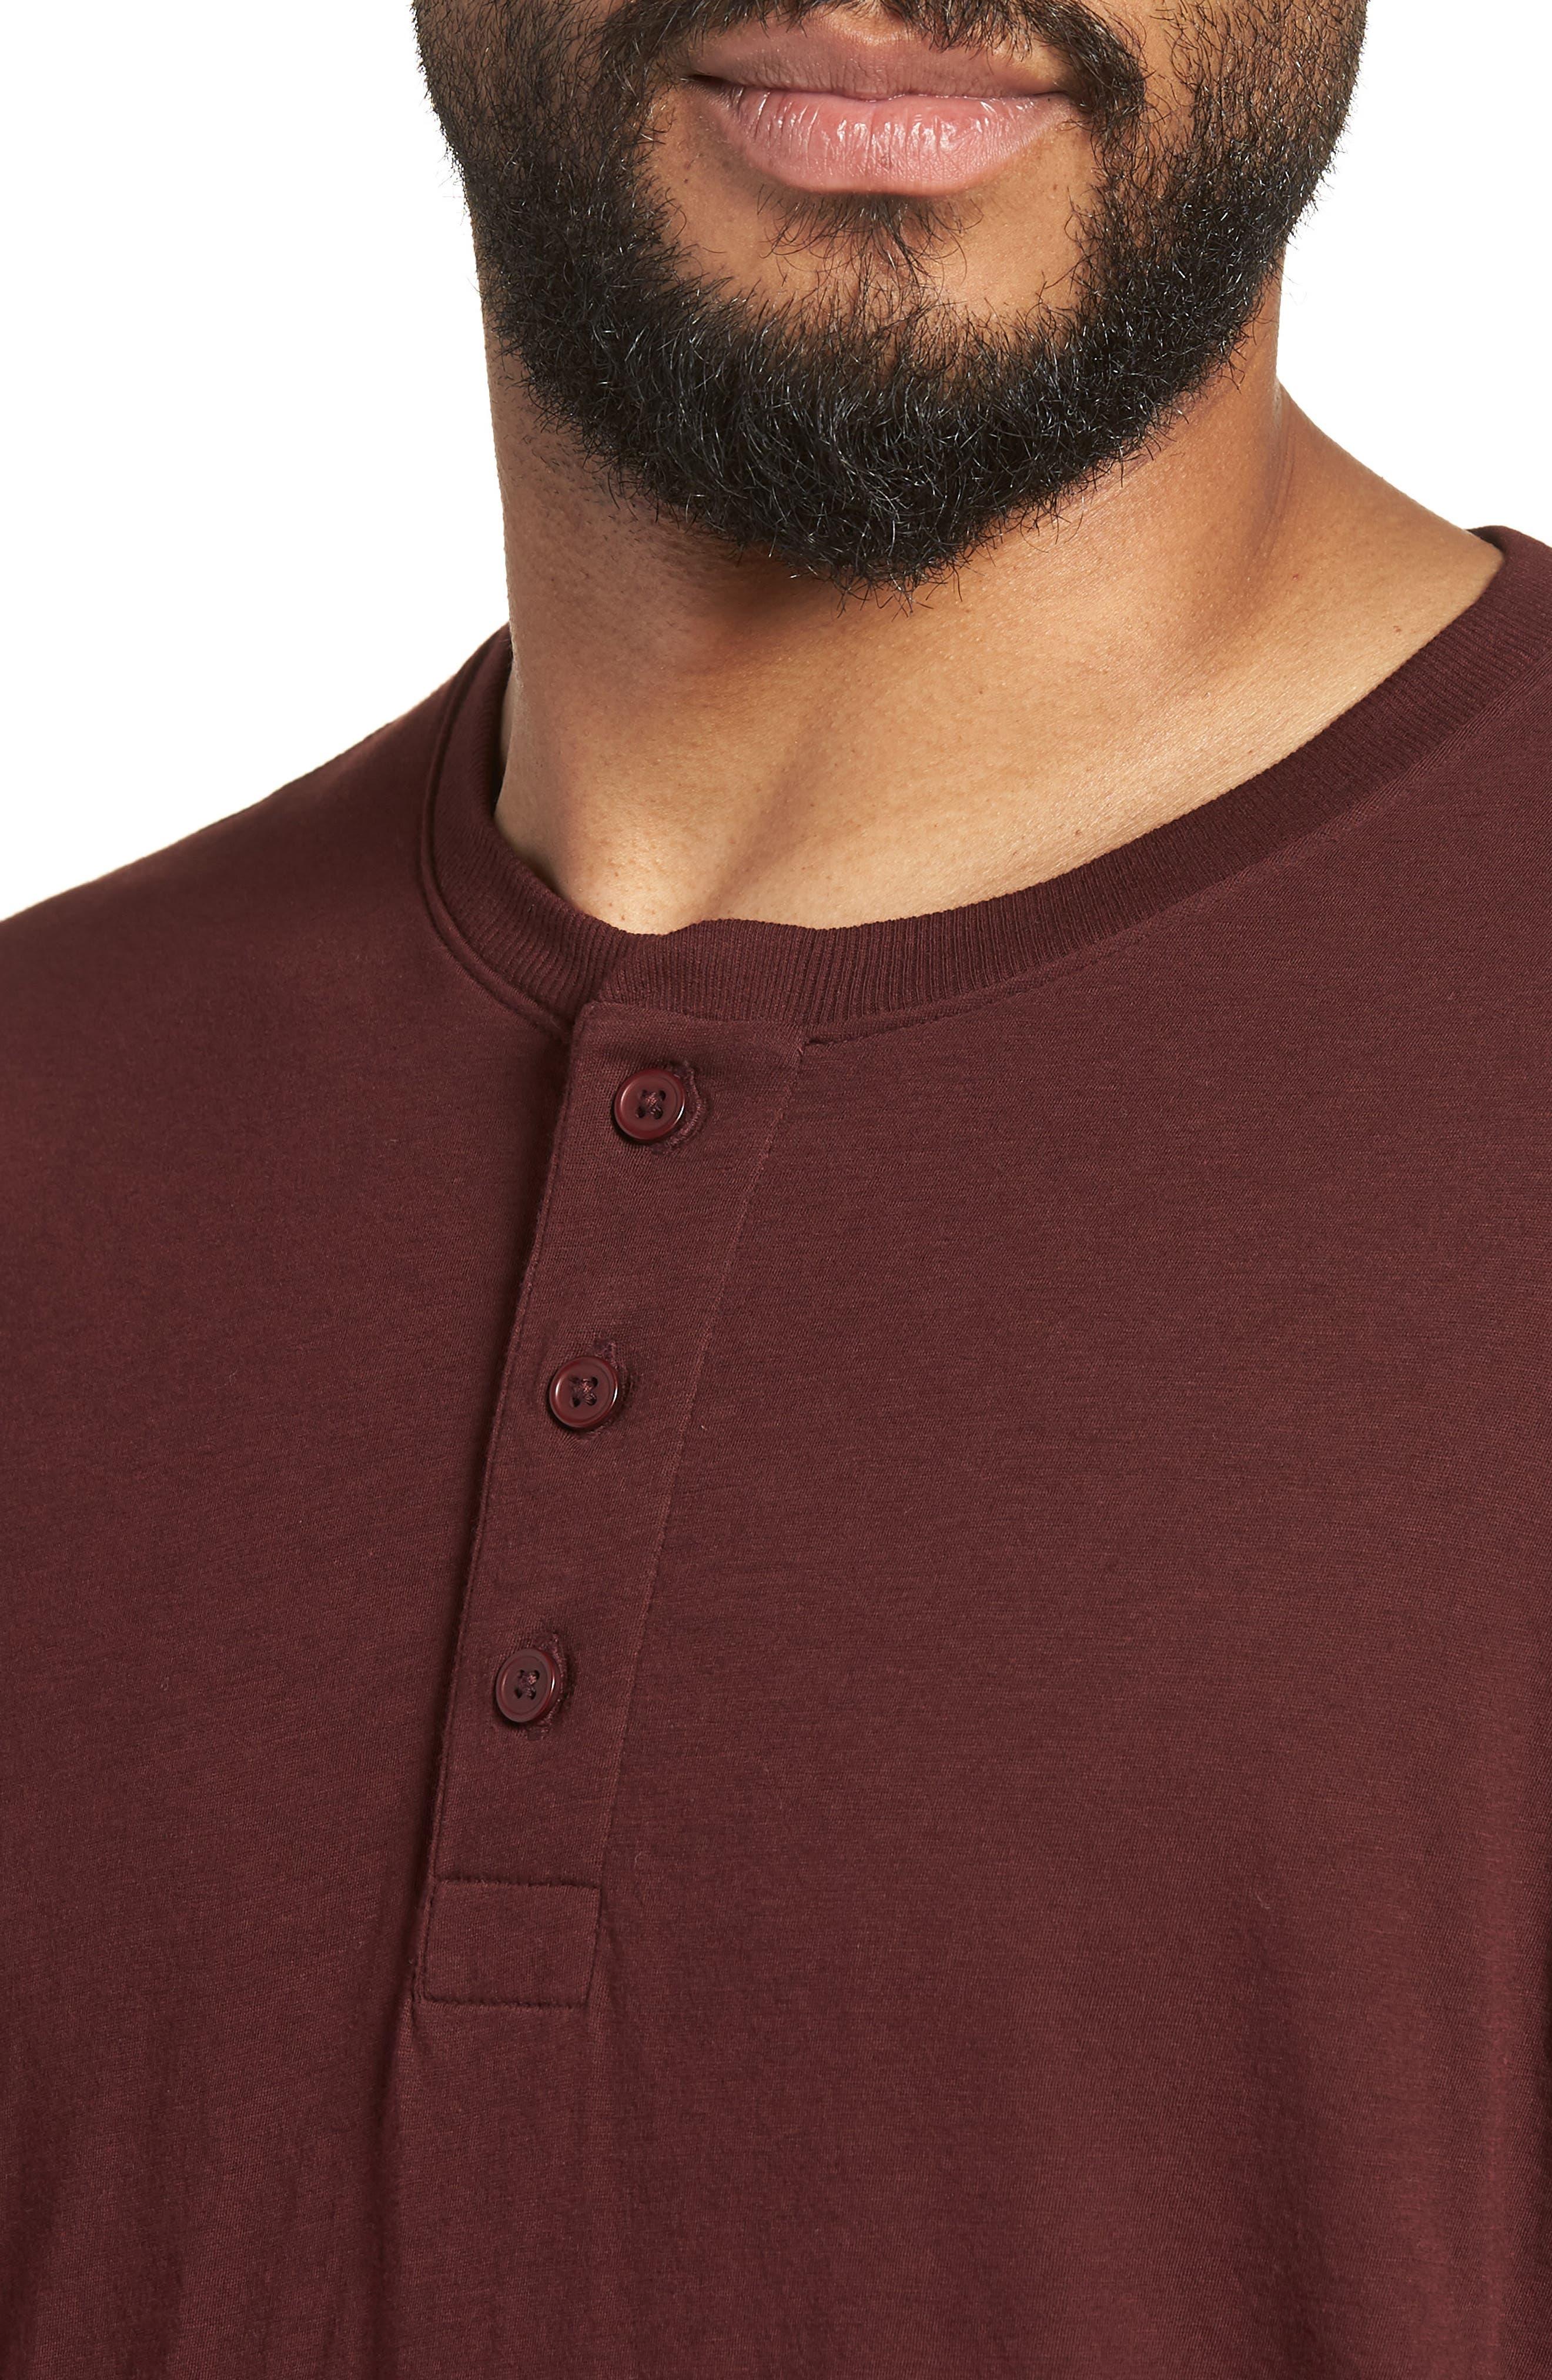 Layered Henley T-Shirt,                             Alternate thumbnail 4, color,                             Black Cherry